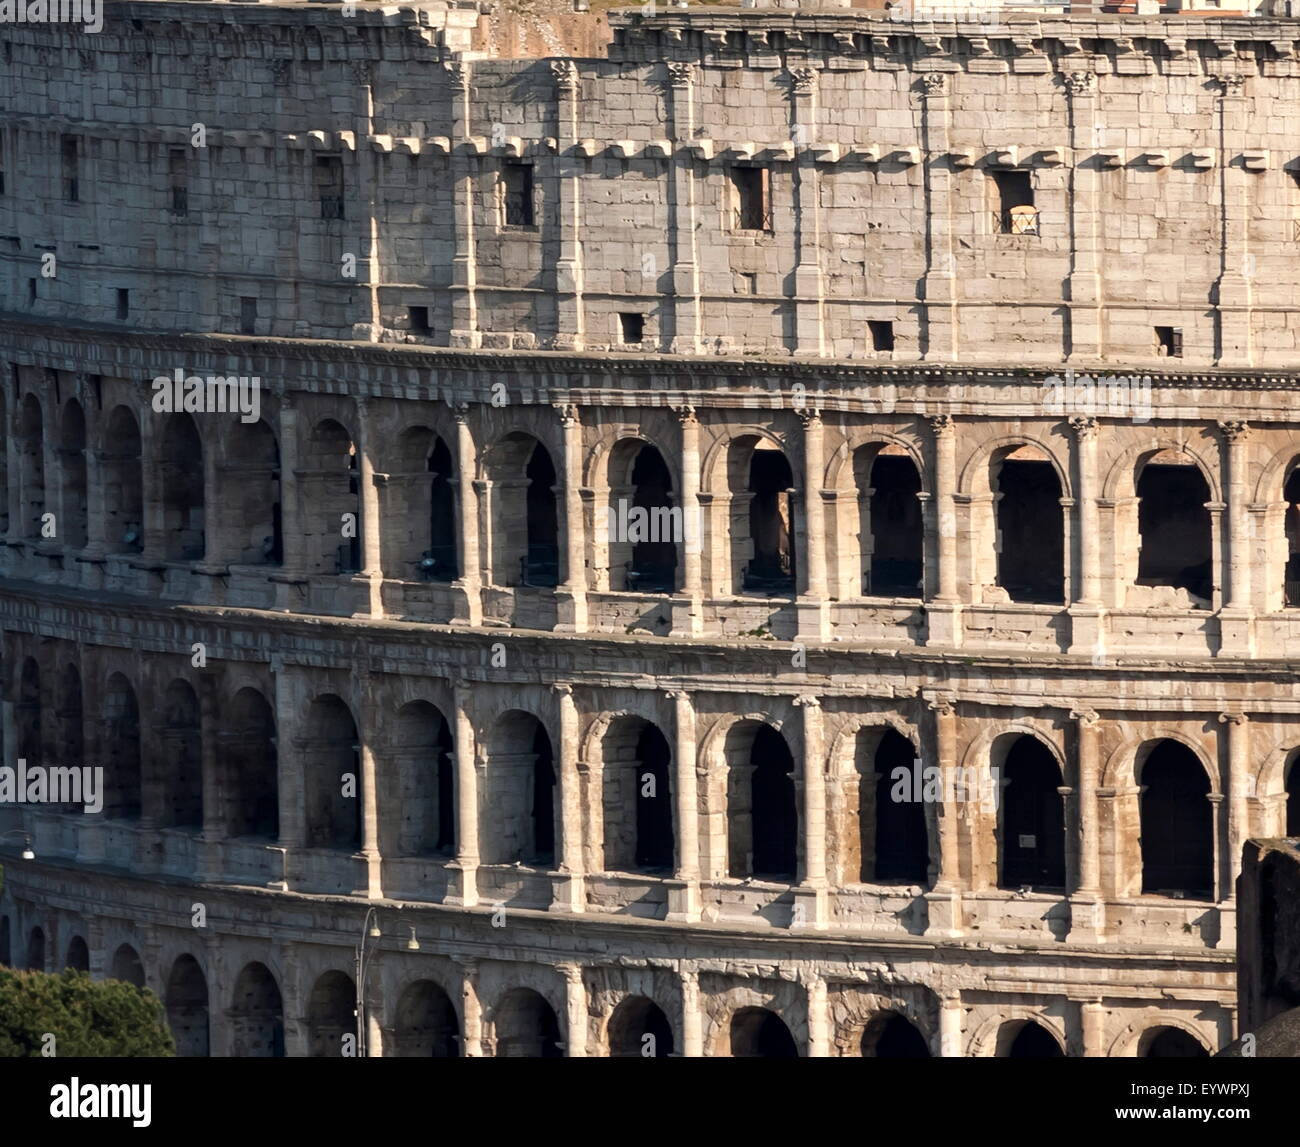 Detail of the Colloseum, UNESCO World Heritage Site, Rome, Lazio, Italy, Europe - Stock Image